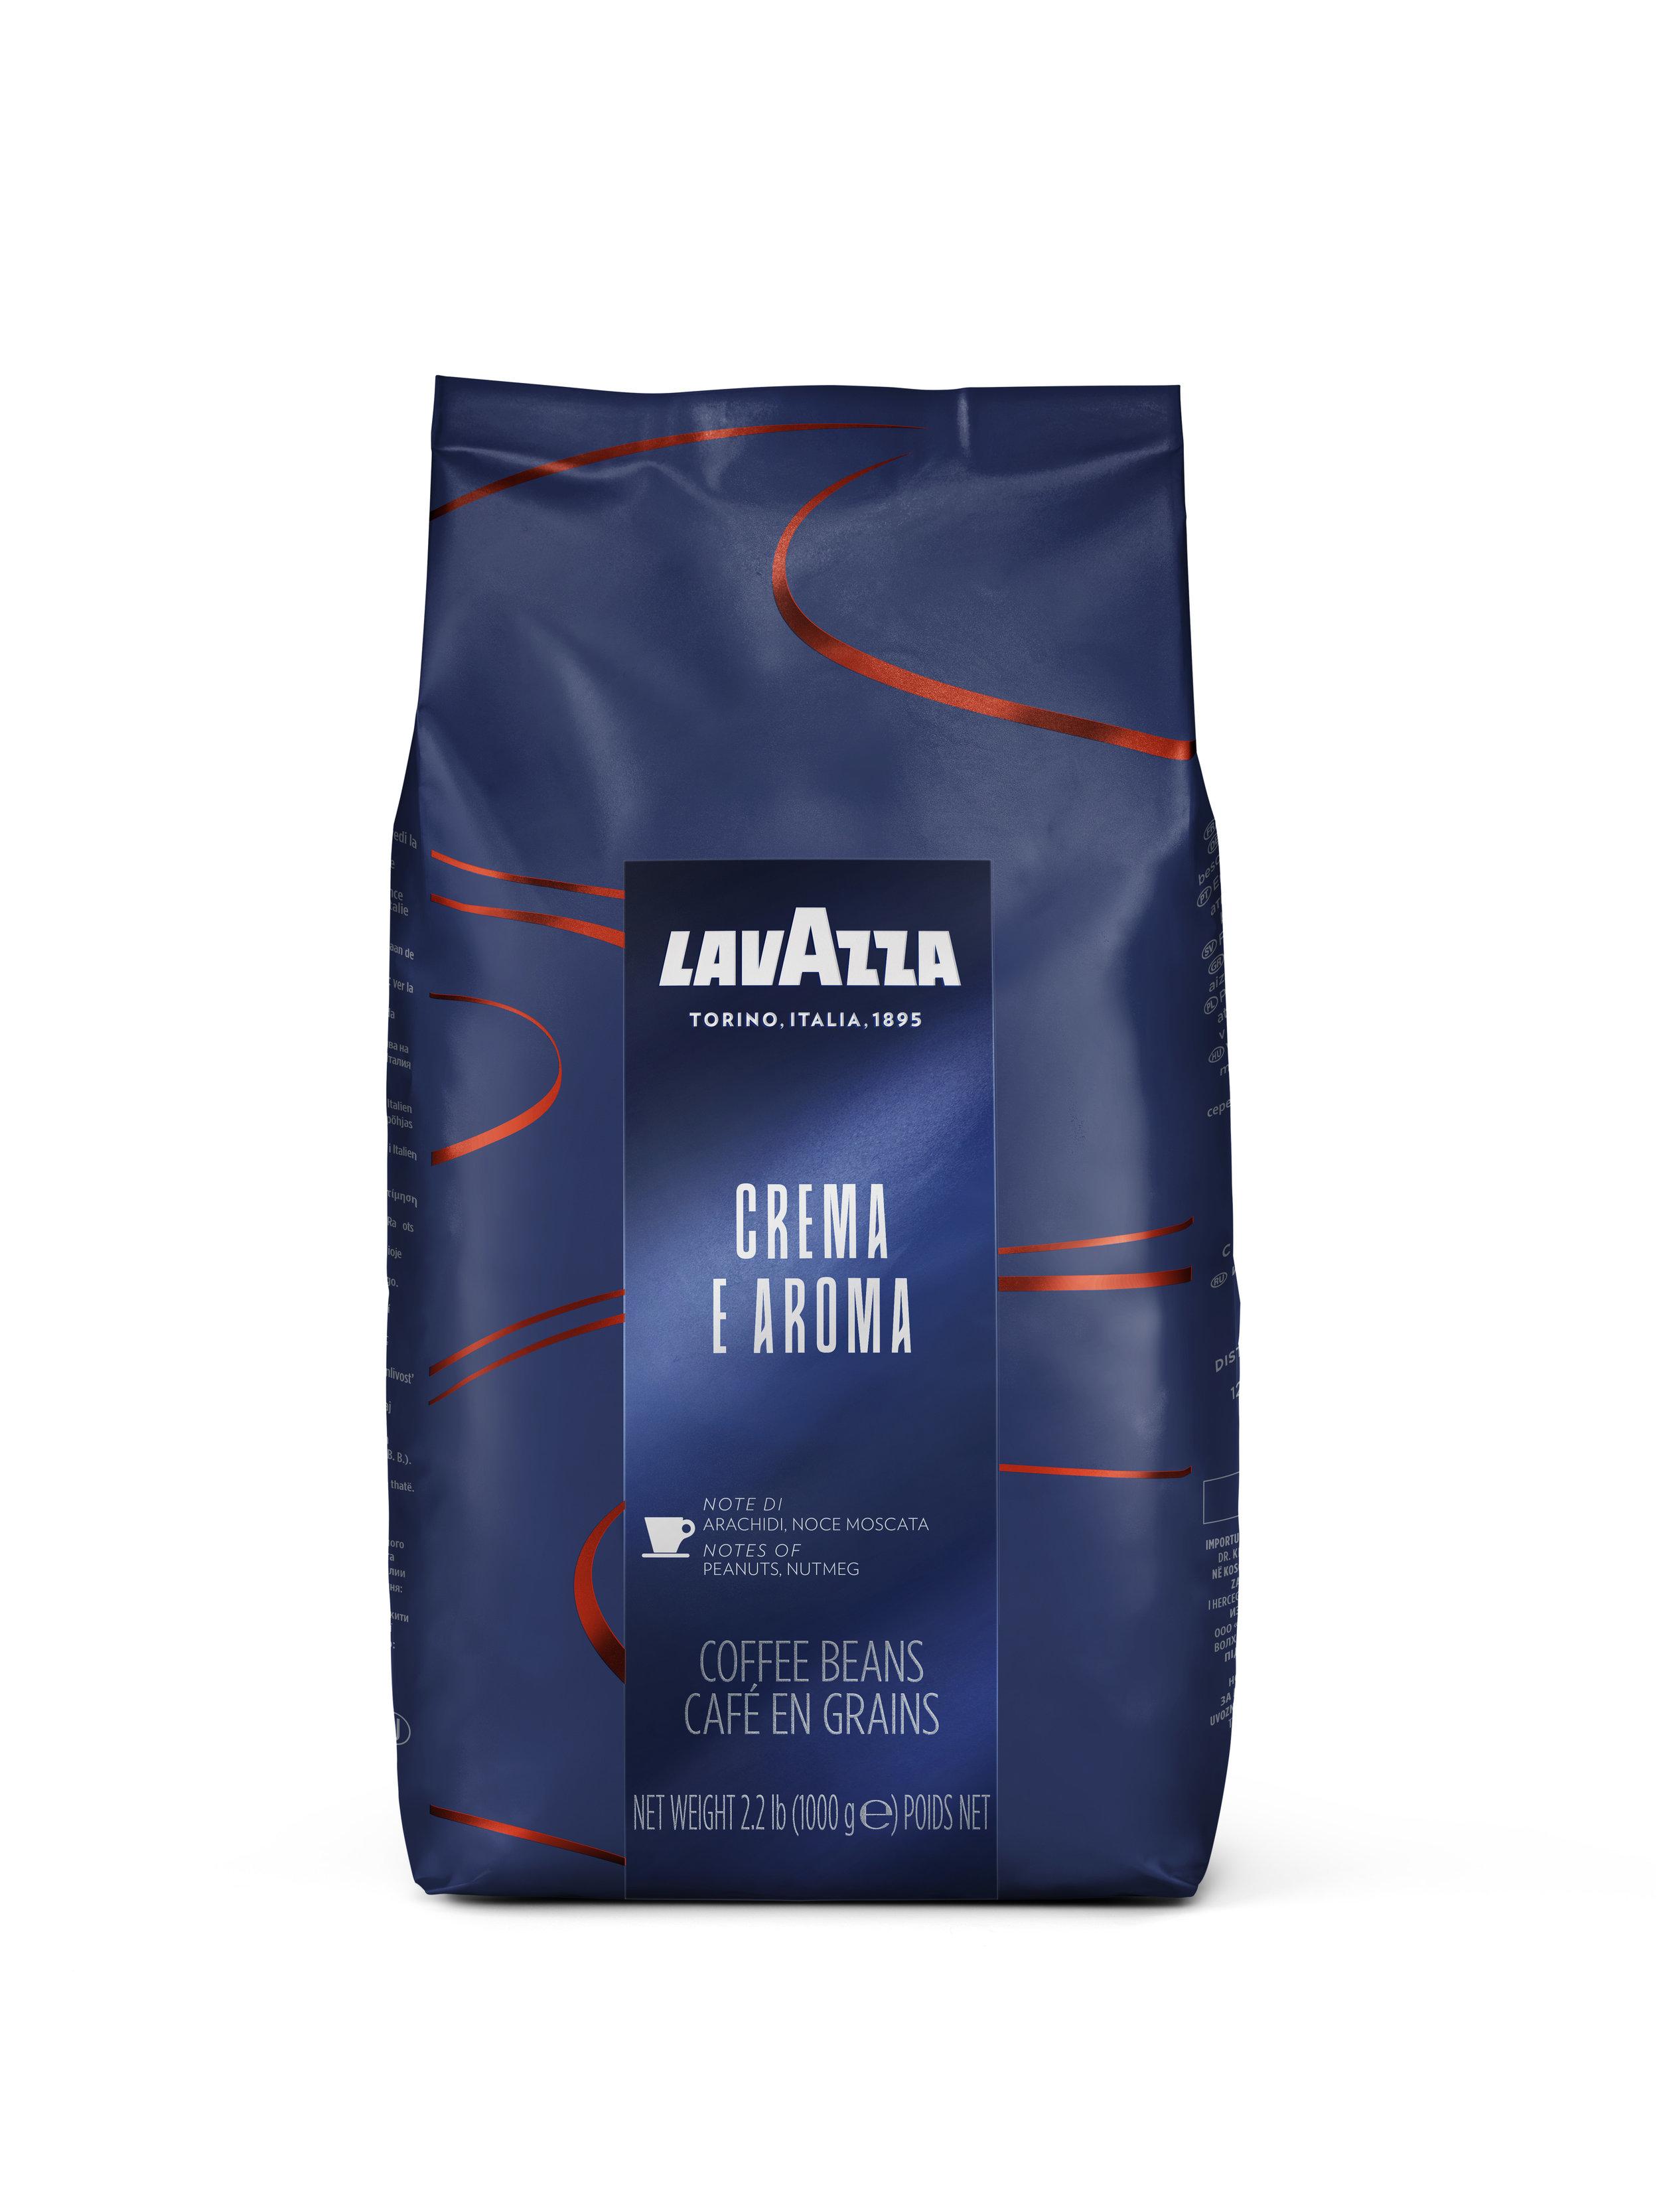 lavazza Crema Aroma-new packaging.jpg